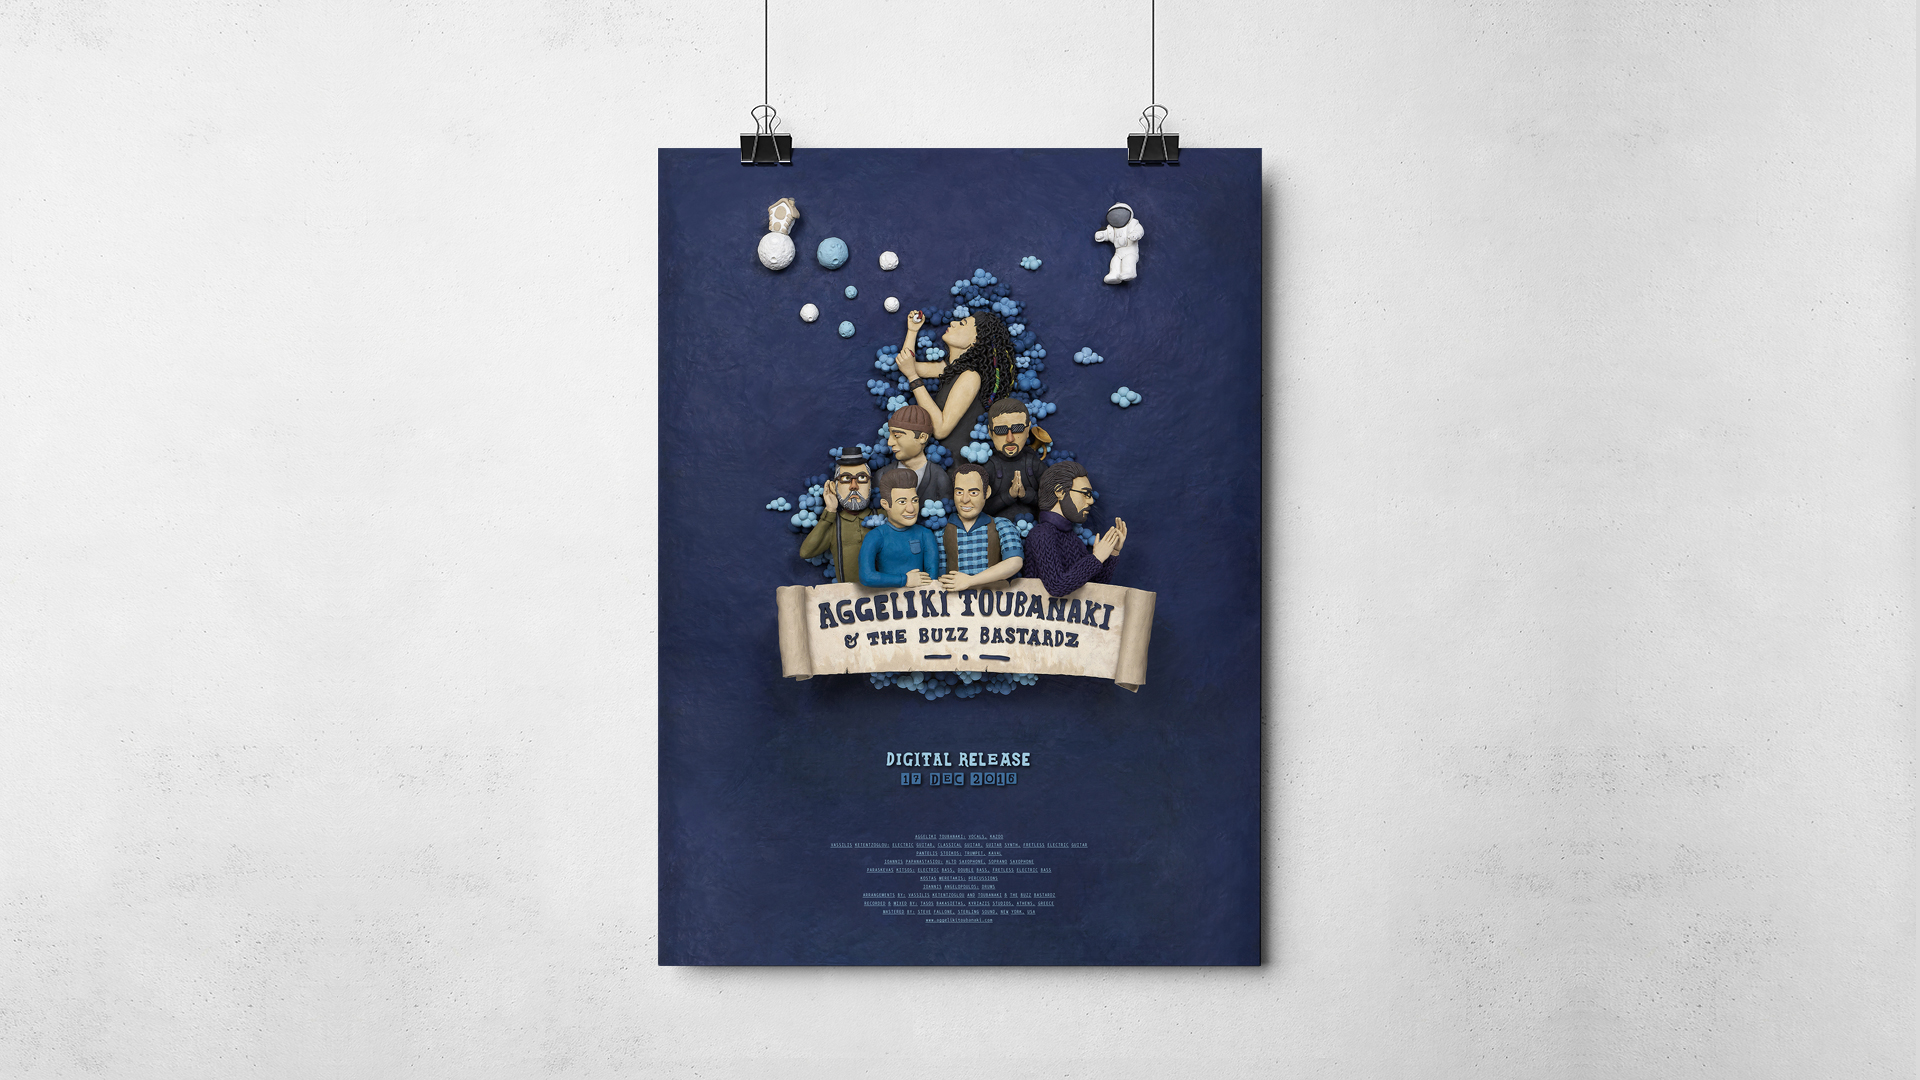 designpark_aggeliki_toubanaki_cd_poster_plasticine